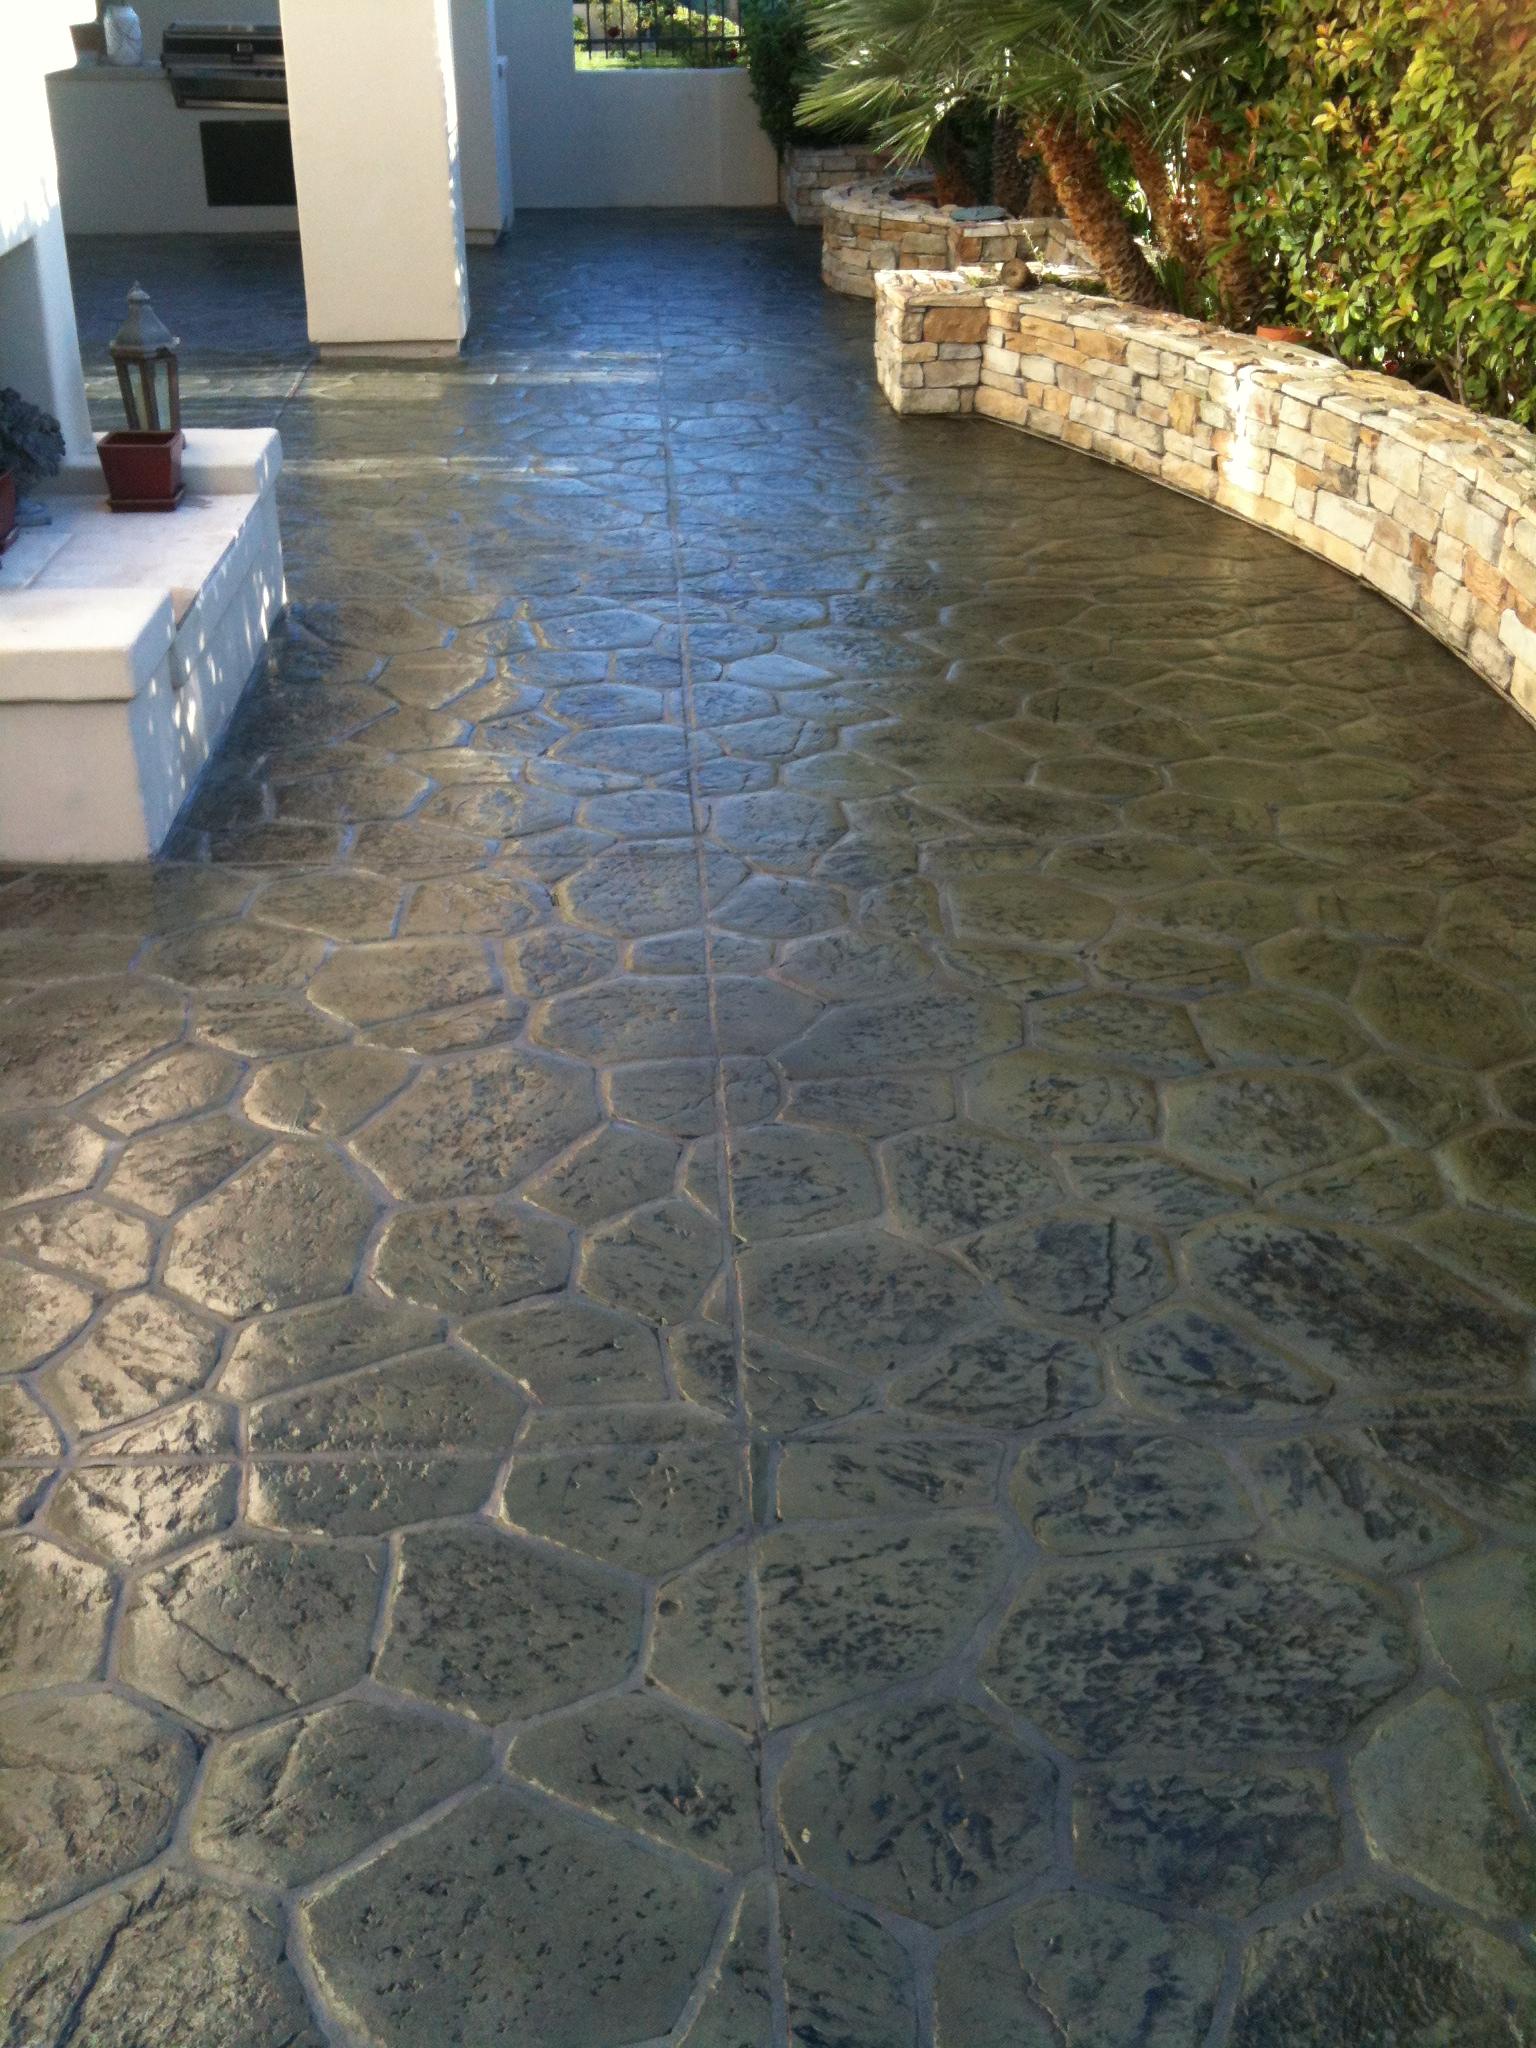 Chief Concrete | Architectural Concrete Specialists